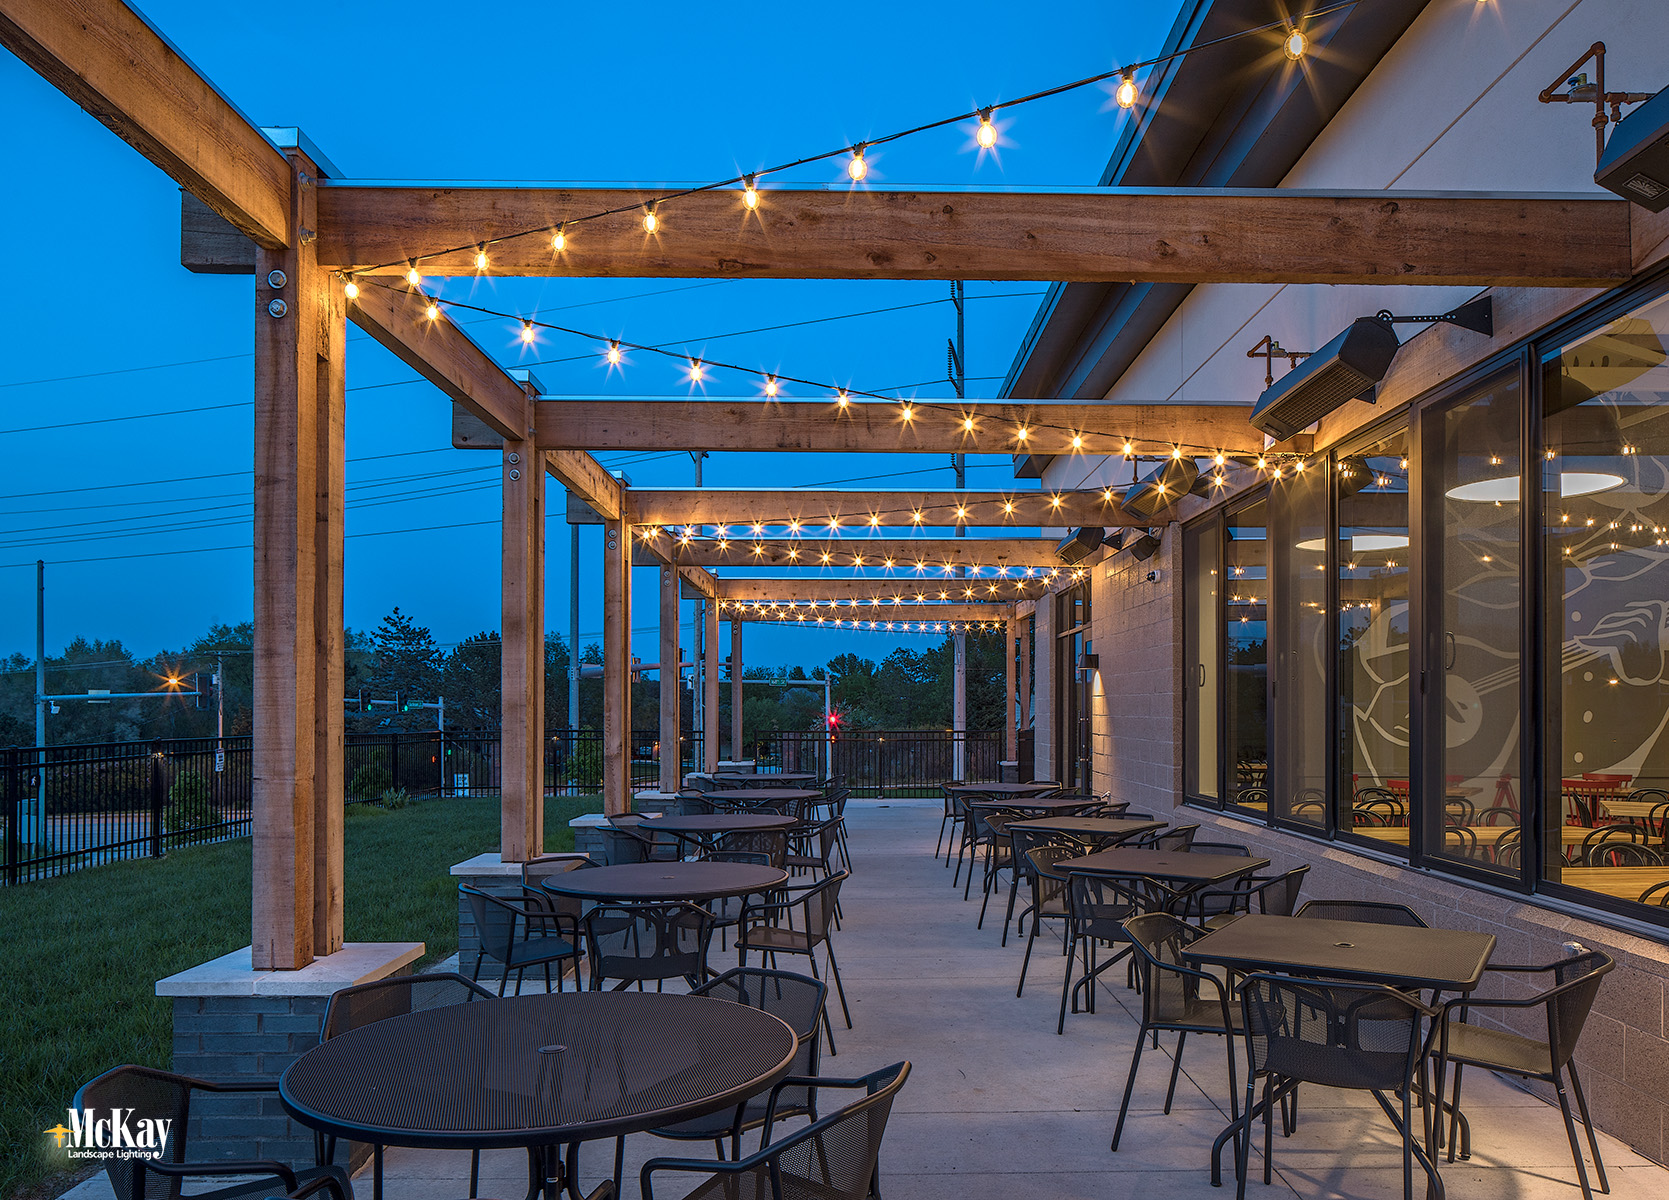 Outdoor String Lights Enhance Restaurant Patio Ambiance Omaha Nebraska | McKay Landscape Lighting